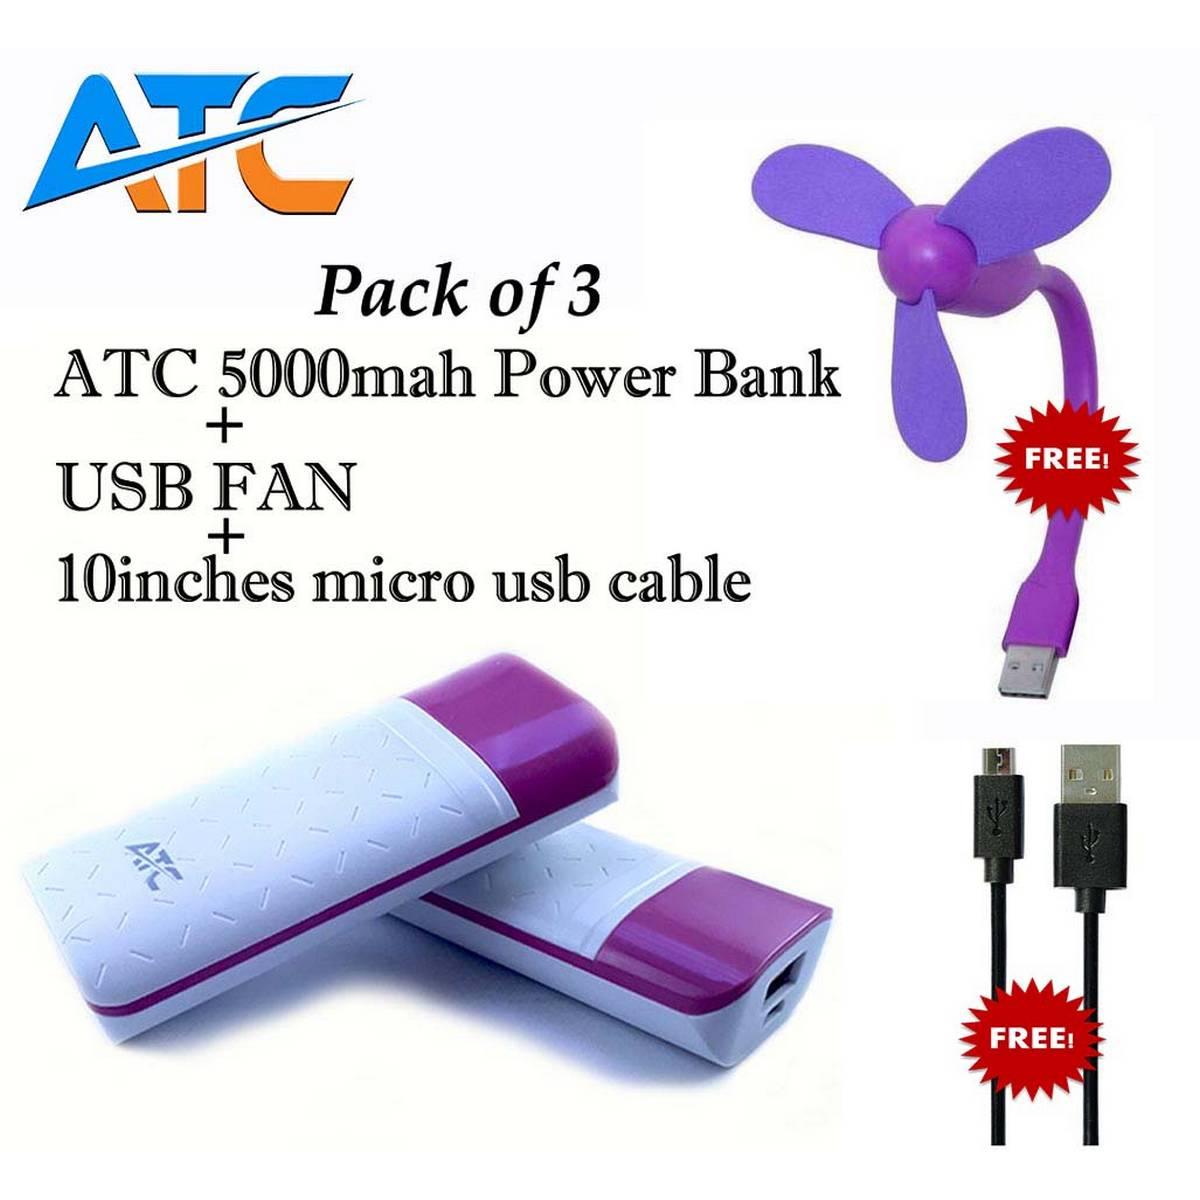 ATC 5000mah Power Bank Free USB Cable  Free USB Fan | pack of 3